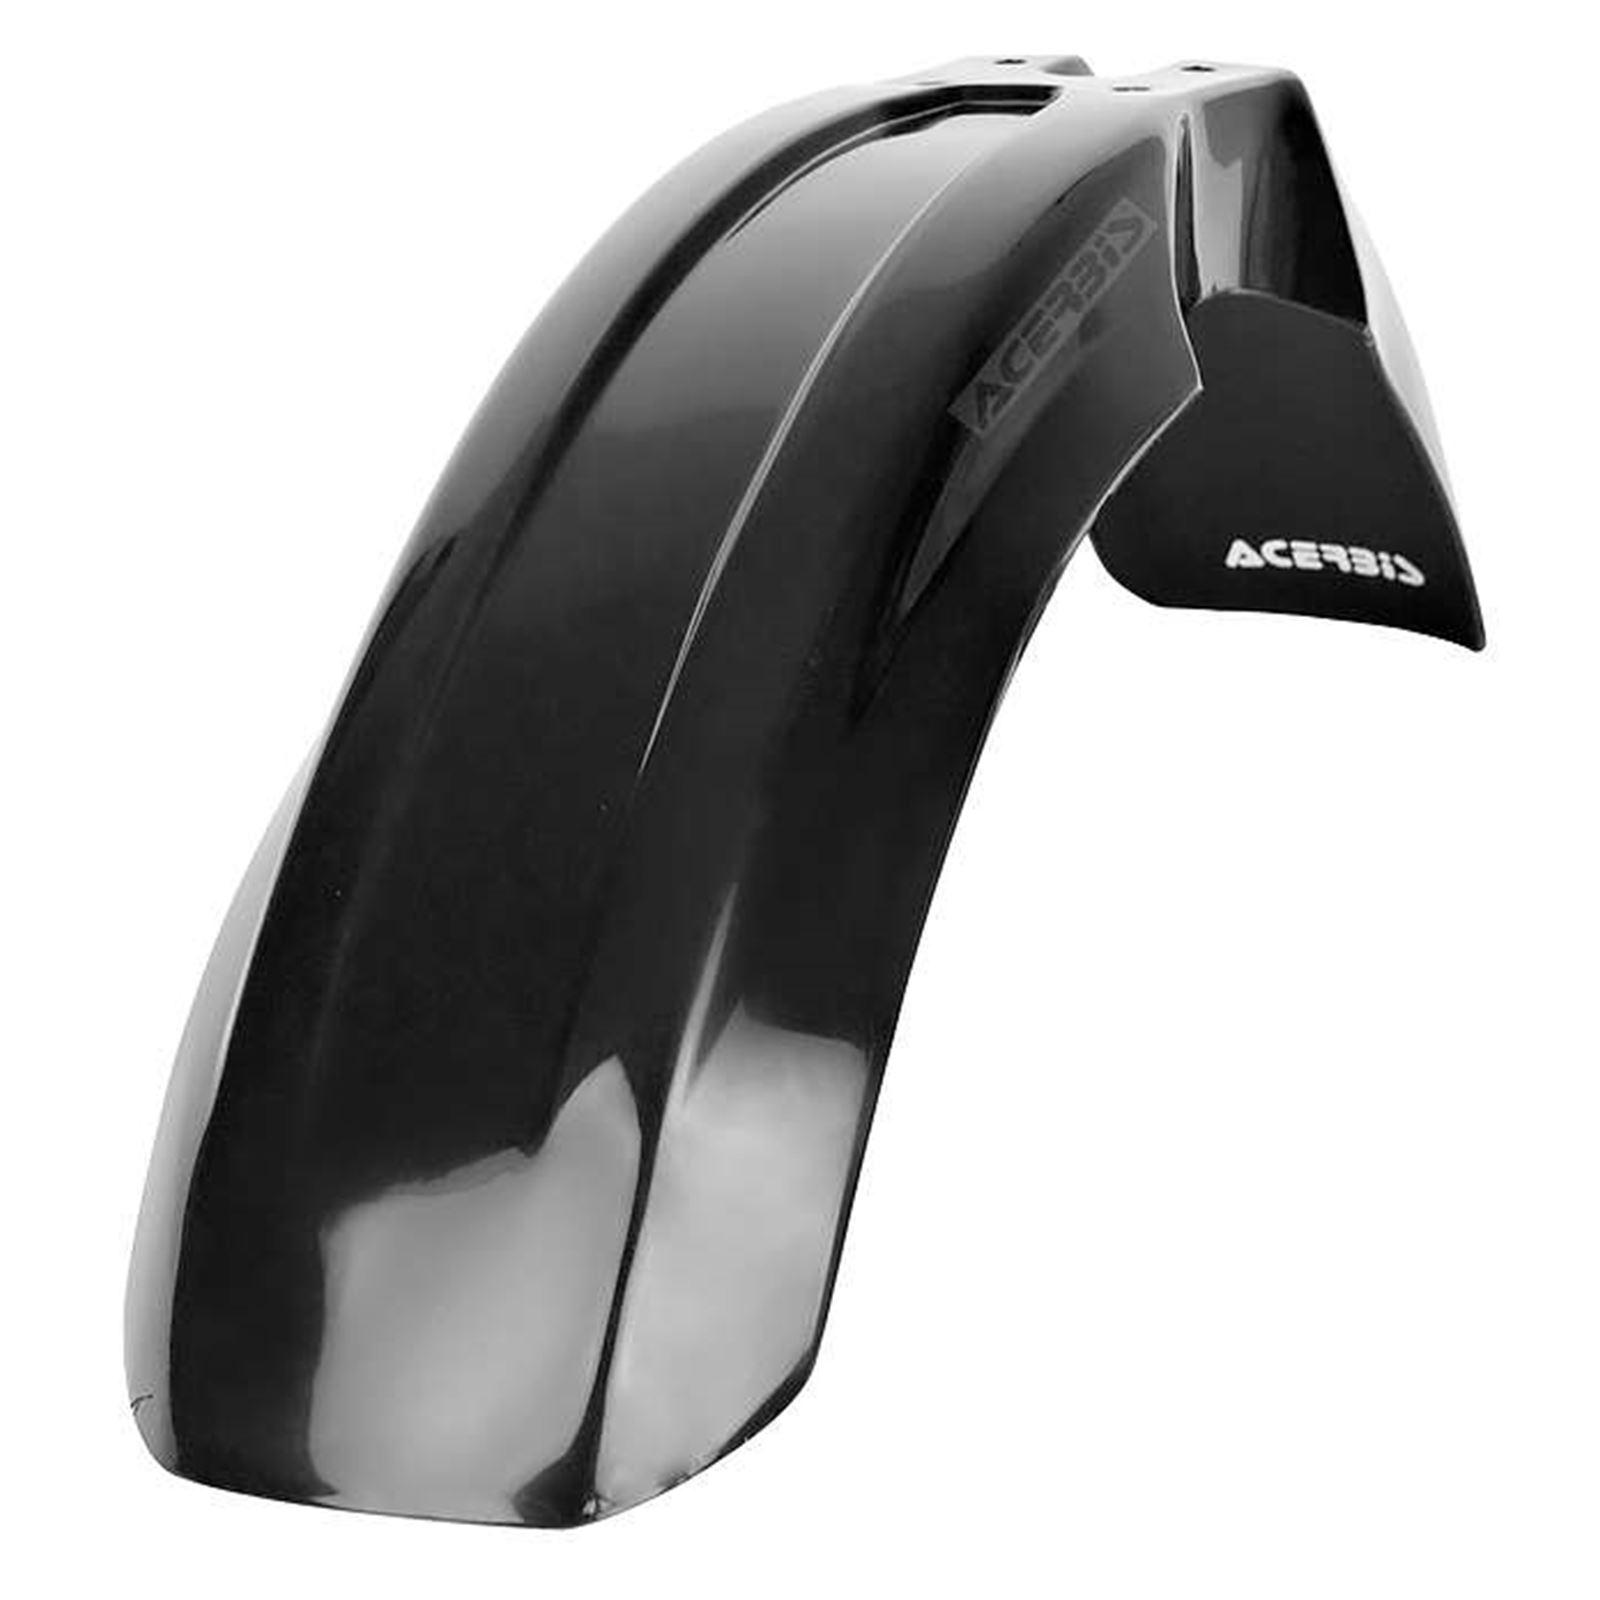 Acerbis Front Fender